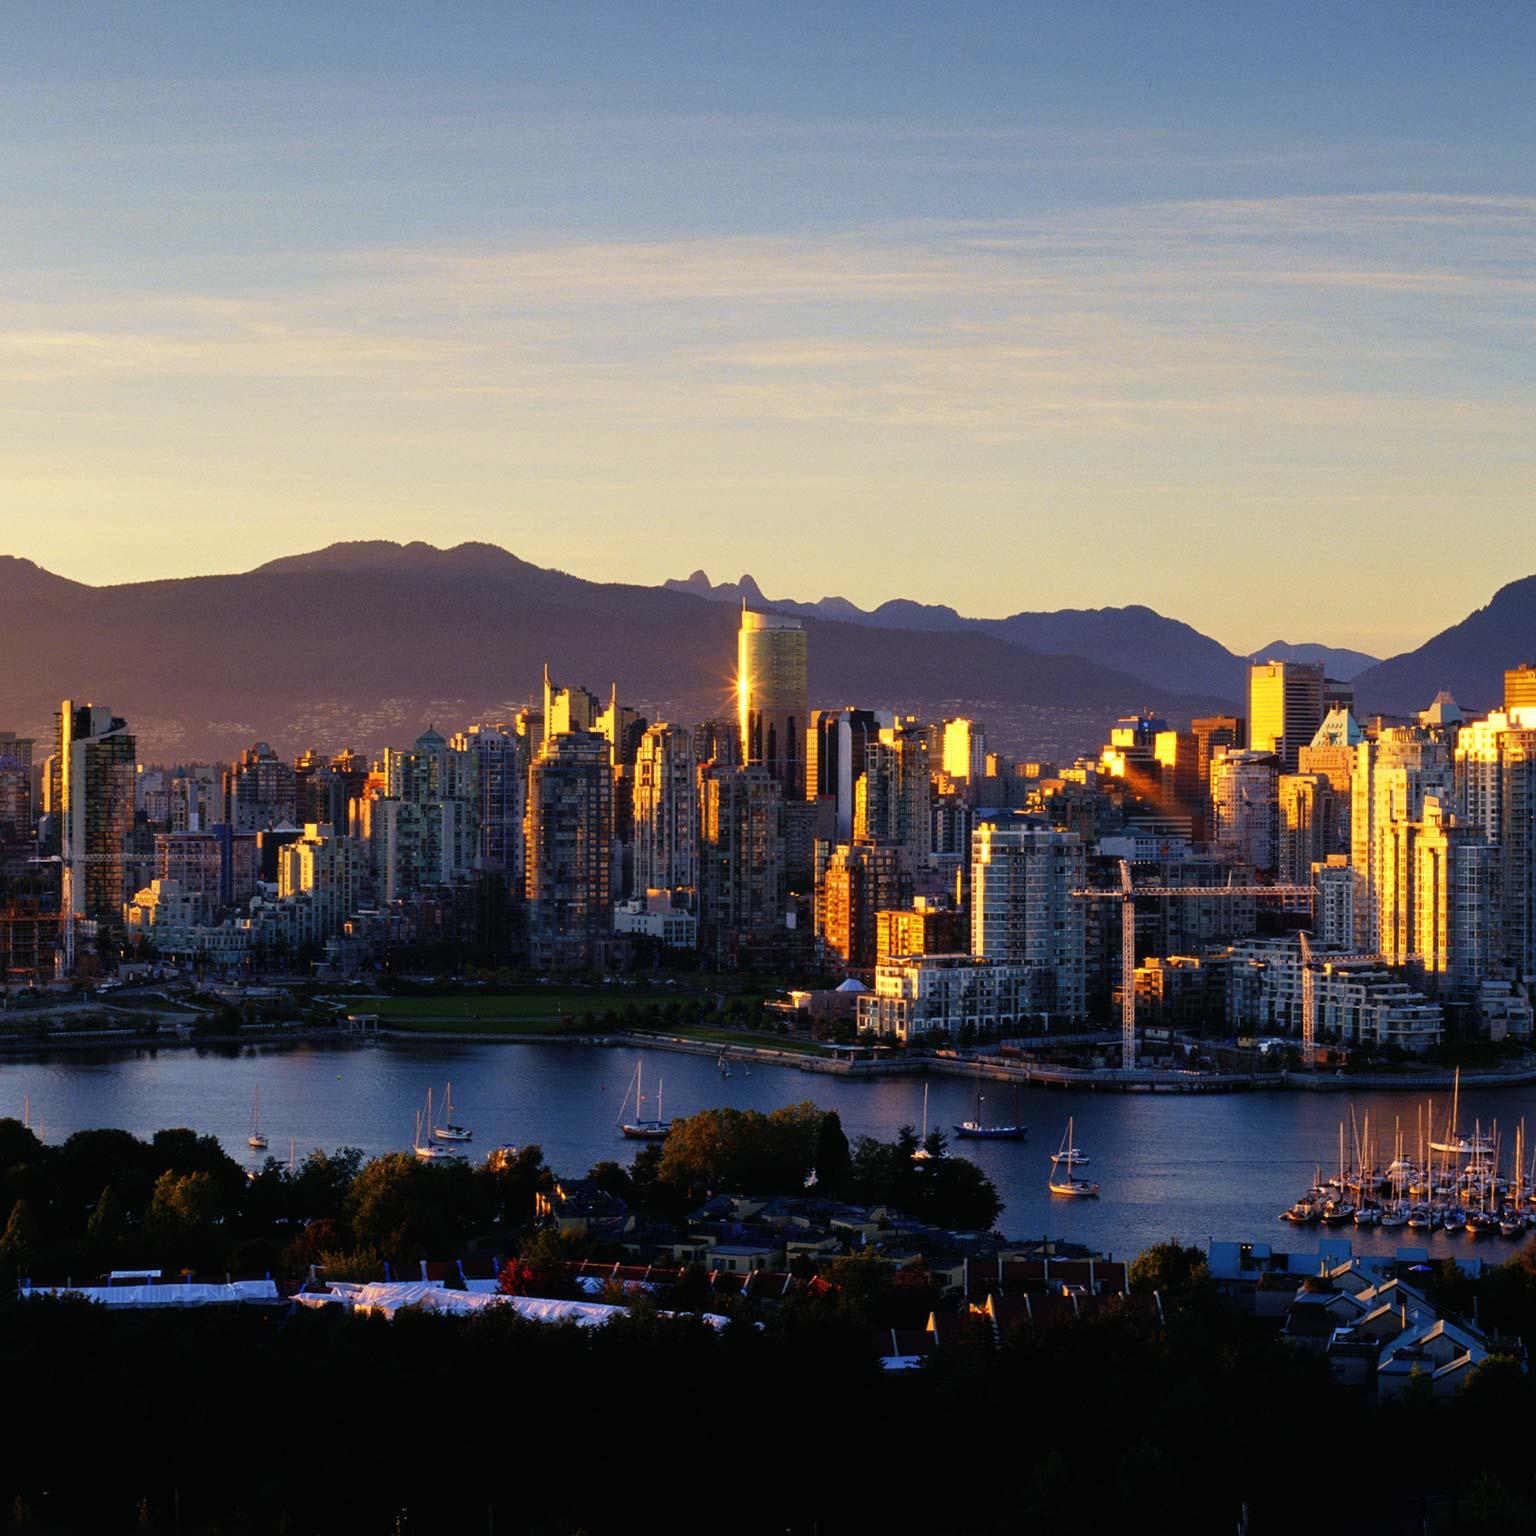 Flüge: Kanada [Januar - März] - Hin- und Rückflug von Amsterdam nach Vancouver ab nur 380€ inkl. Gepäck